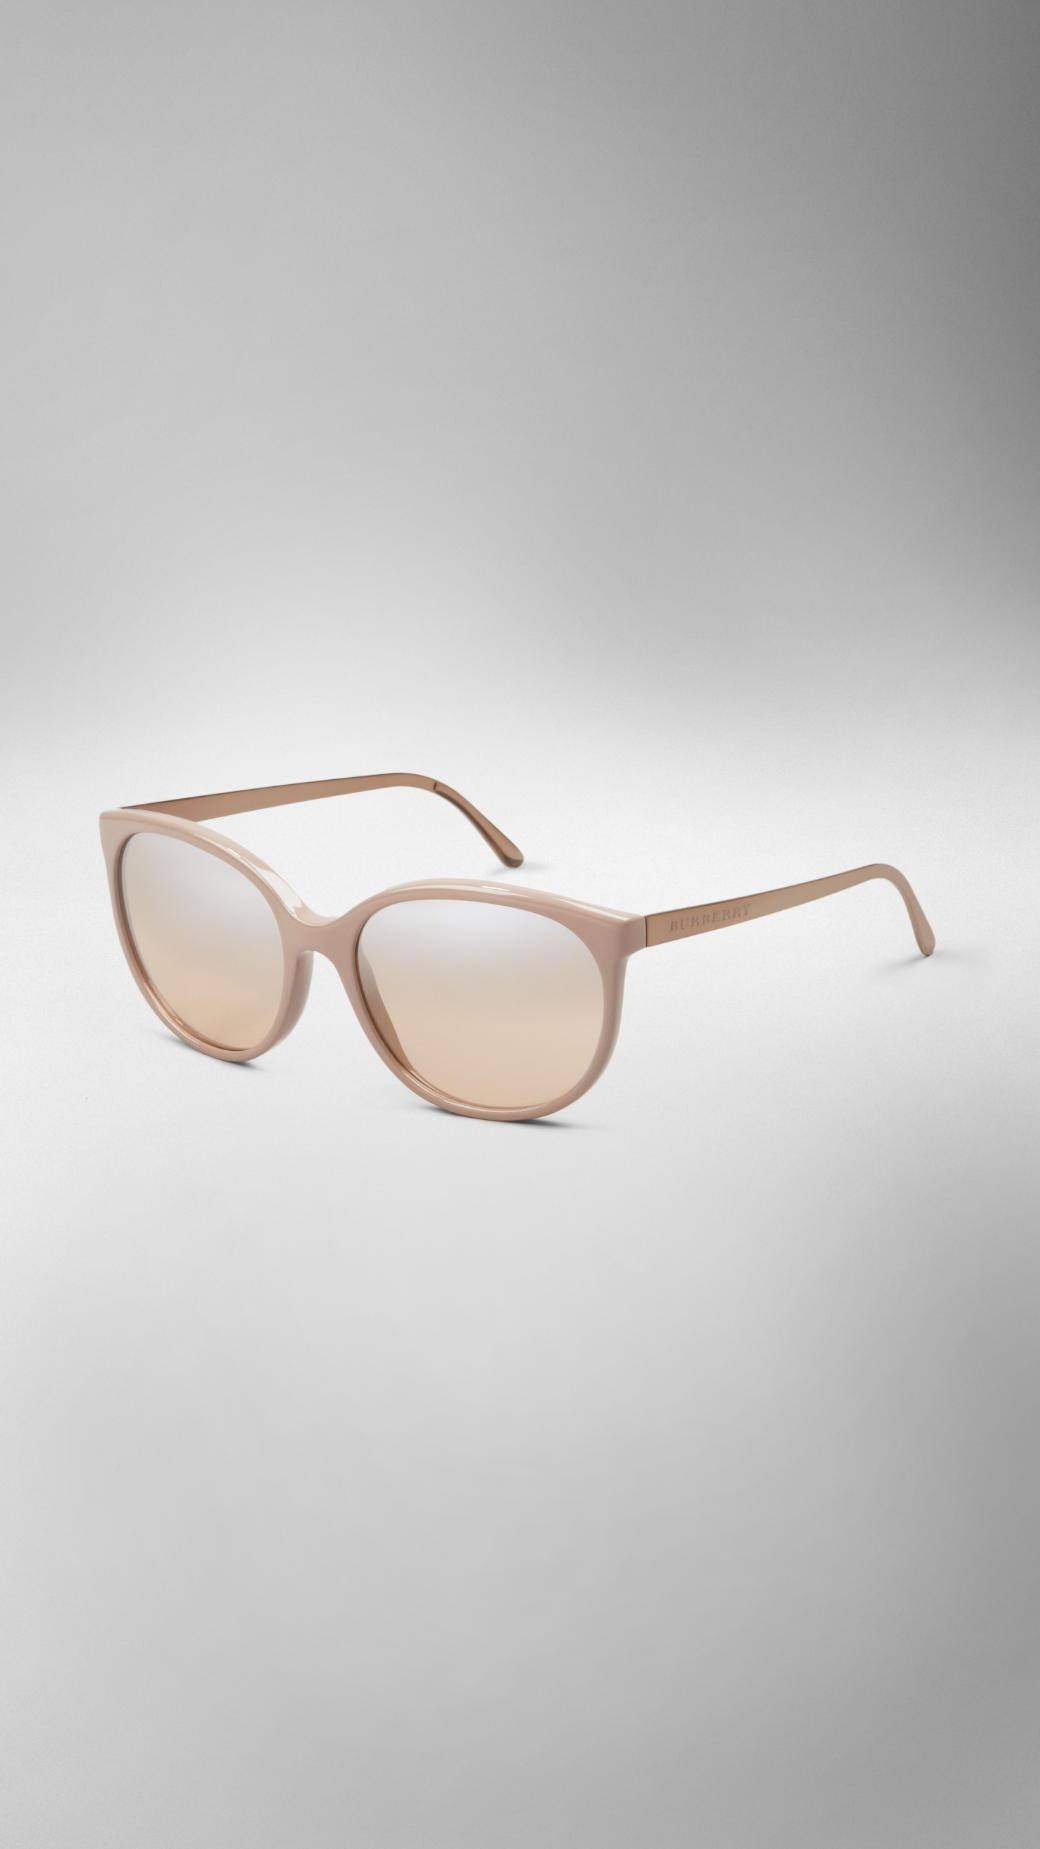 452d5e5f5d Burberry Spark Cat-Eye Sunglasses in Natural - Lyst